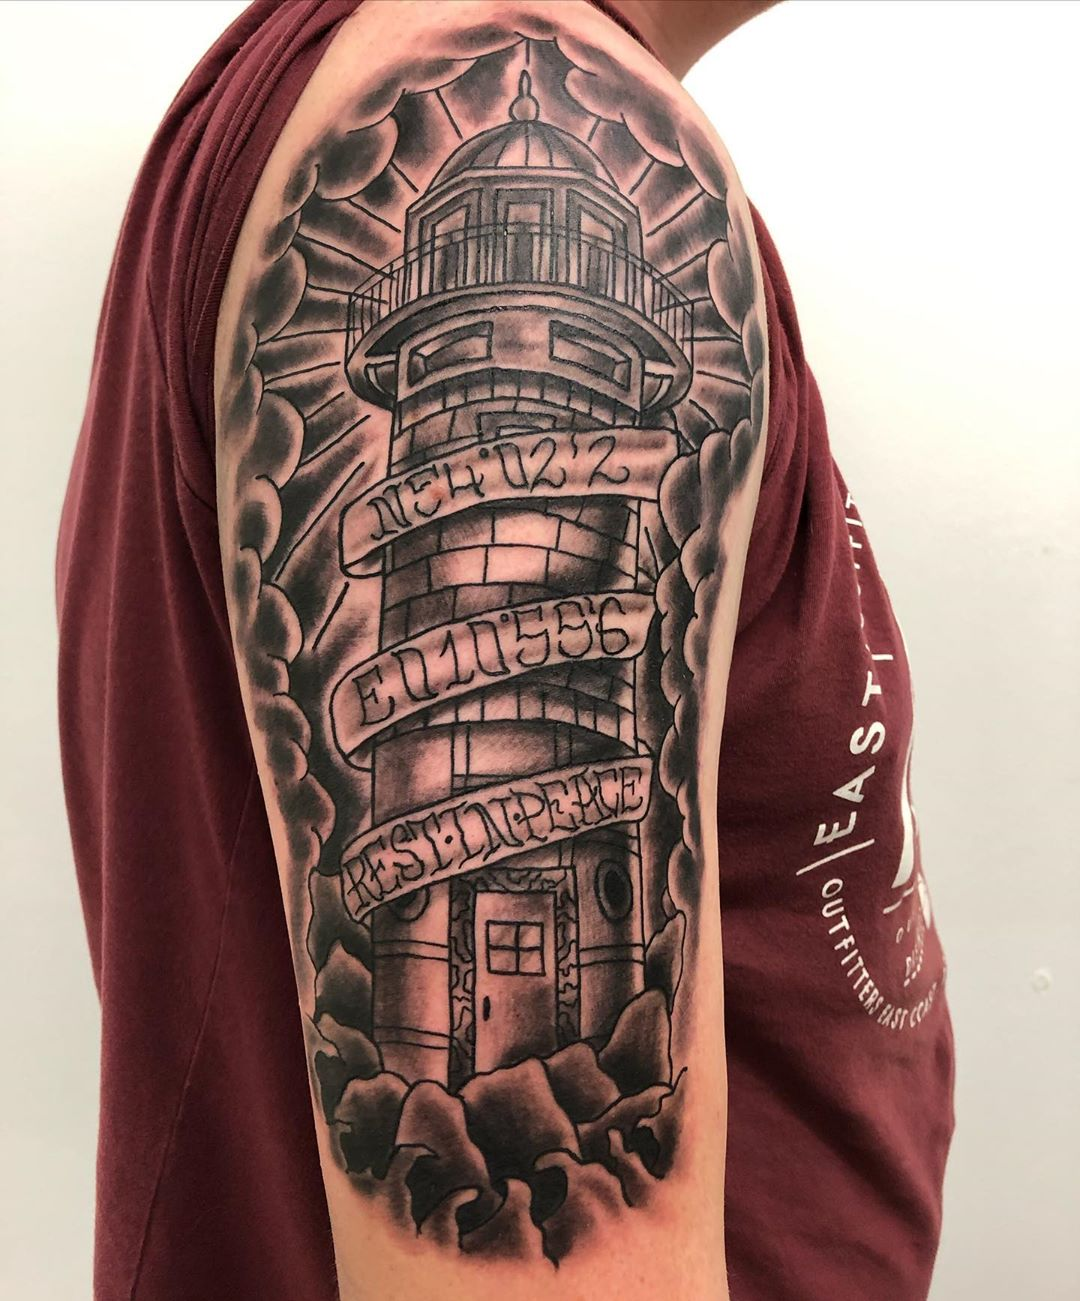 Lighthouse Sleeve Tattoo en Memoriam